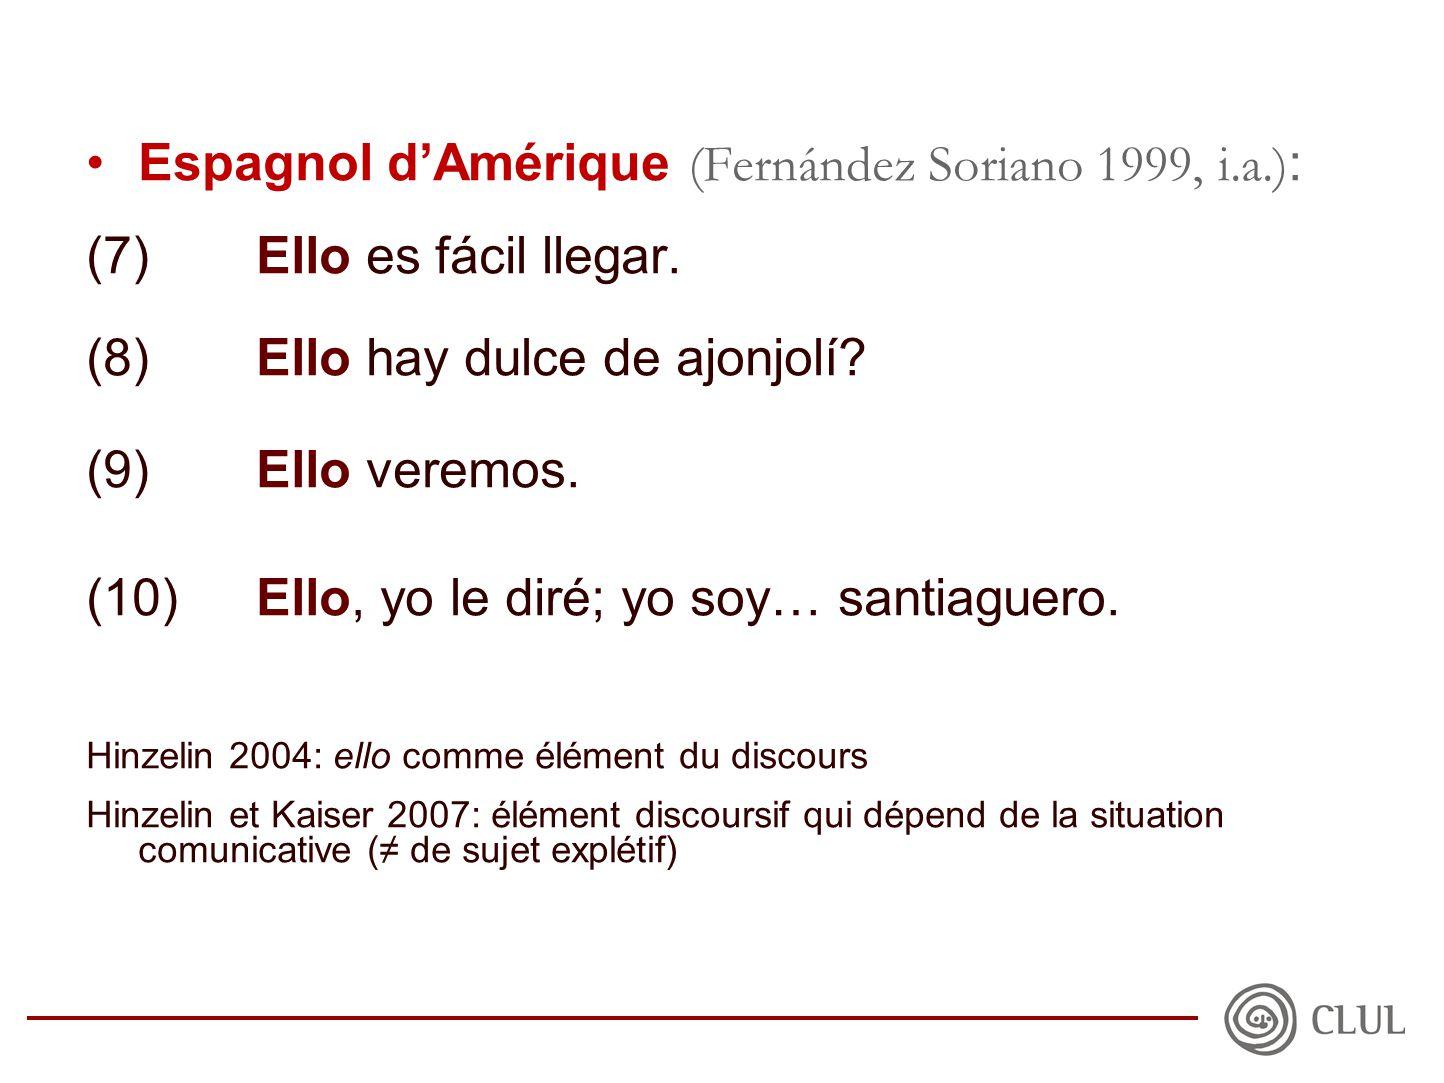 •Espagnol d'Amérique (Fernández Soriano 1999, i.a.) : (7)Ello es fácil llegar.